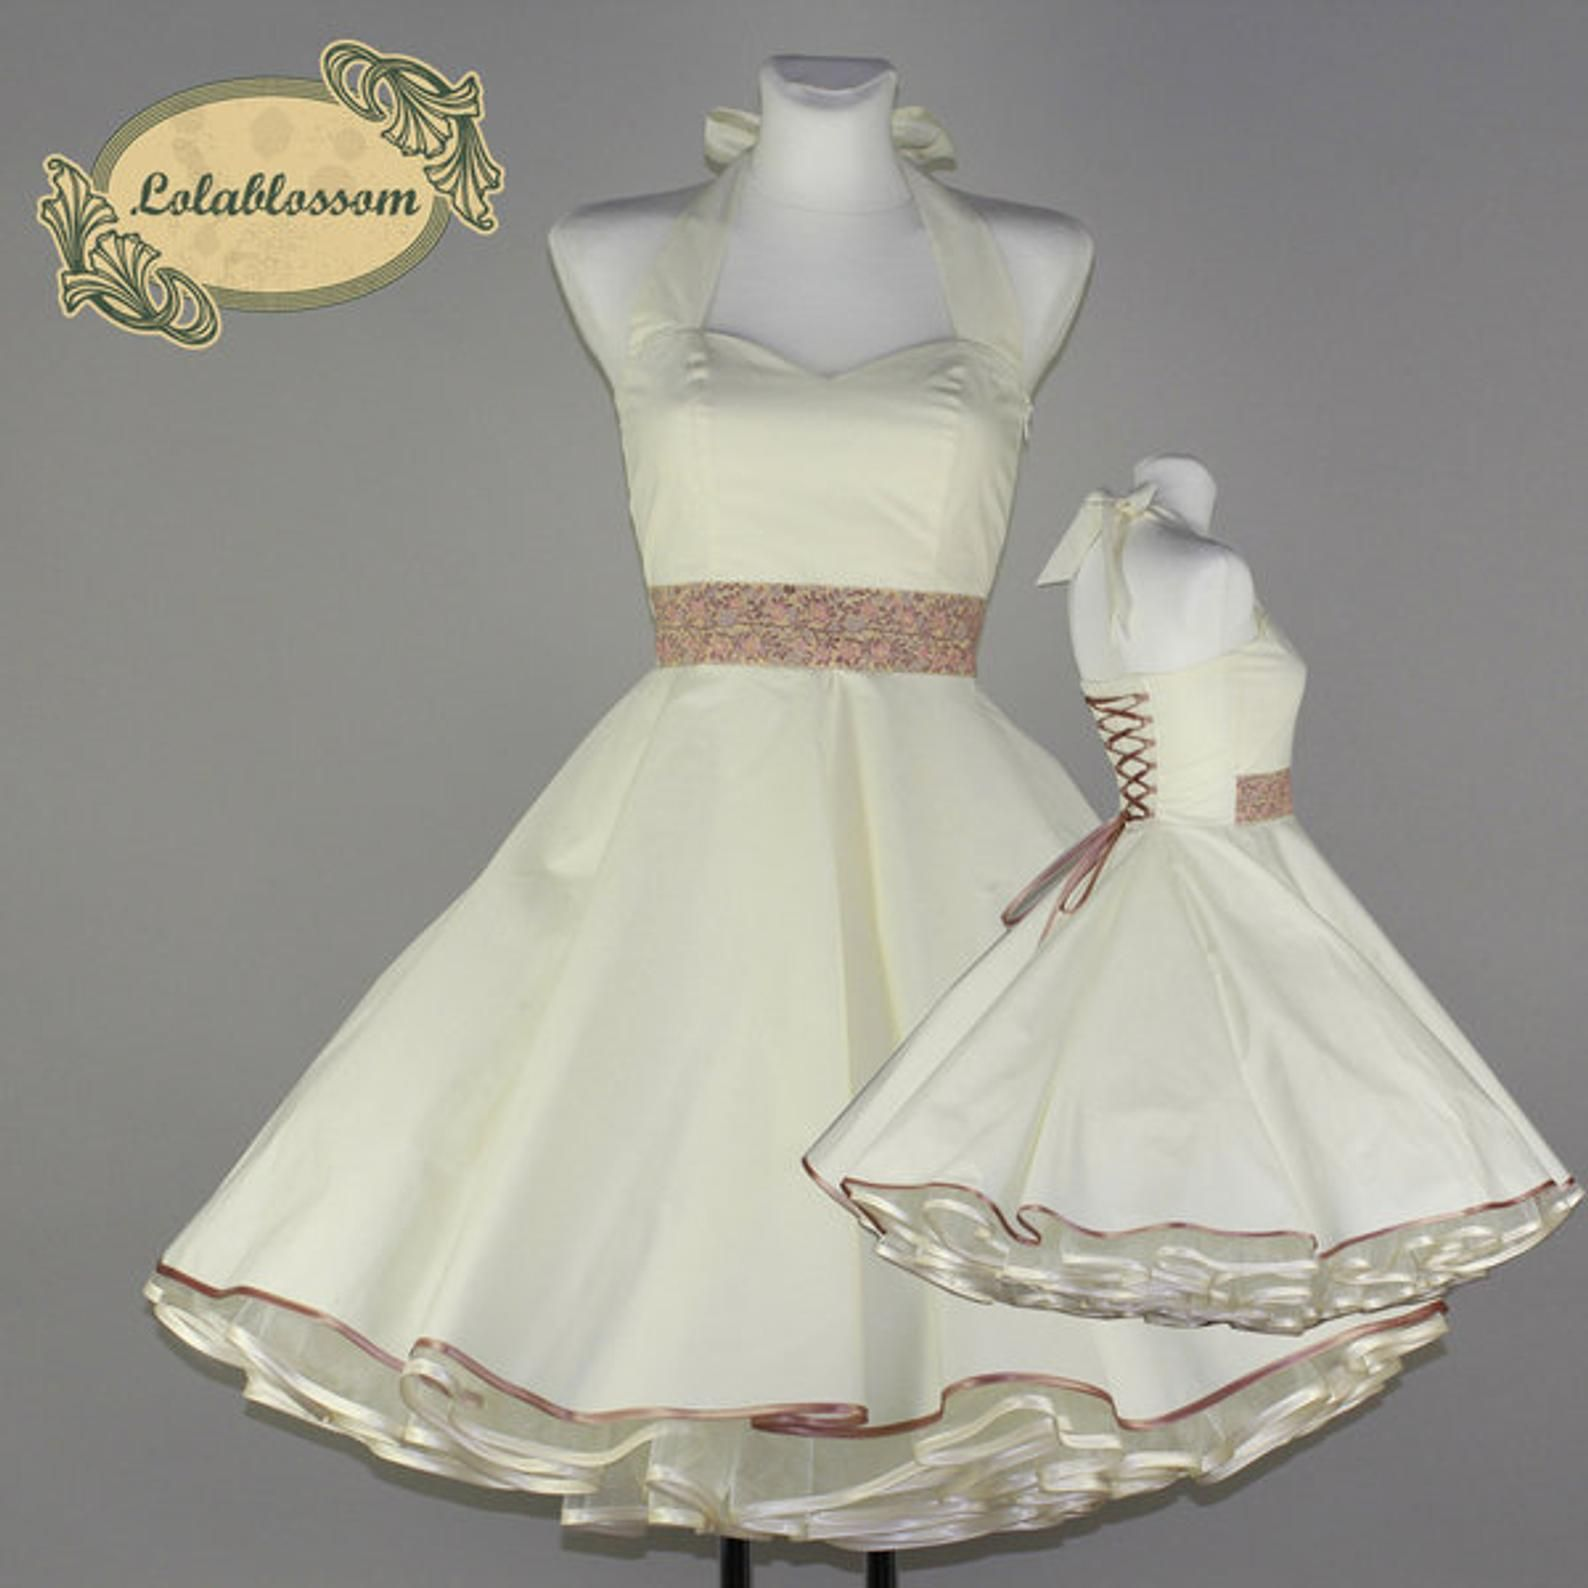 Creme Hochzeitskleid rosa Jacquard Borte #79   Creme ...